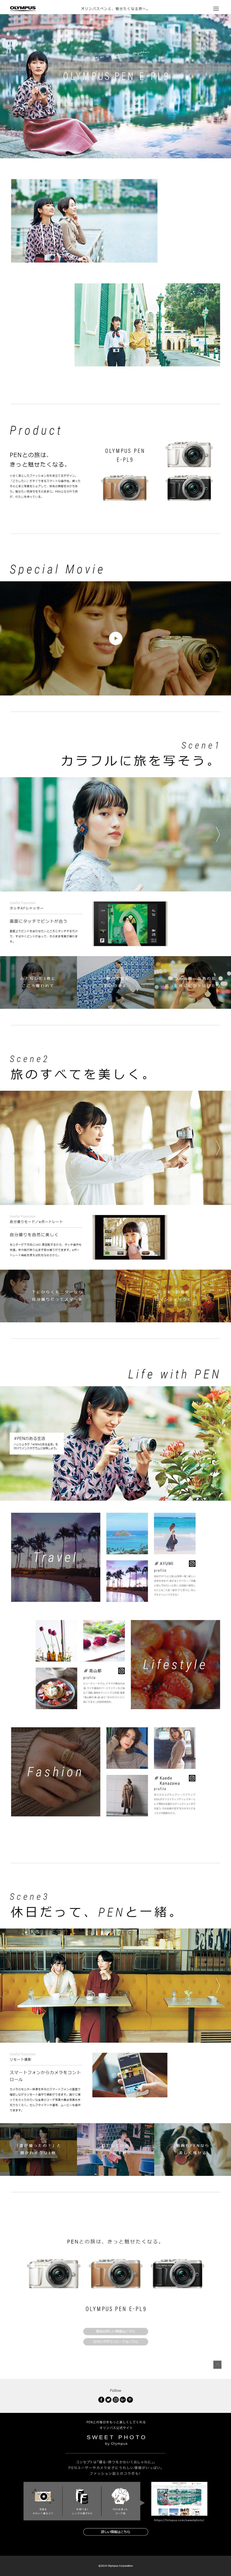 Olympus Pen E Pl9 Sankou Webデザイン グリッドレイアウト ホバー